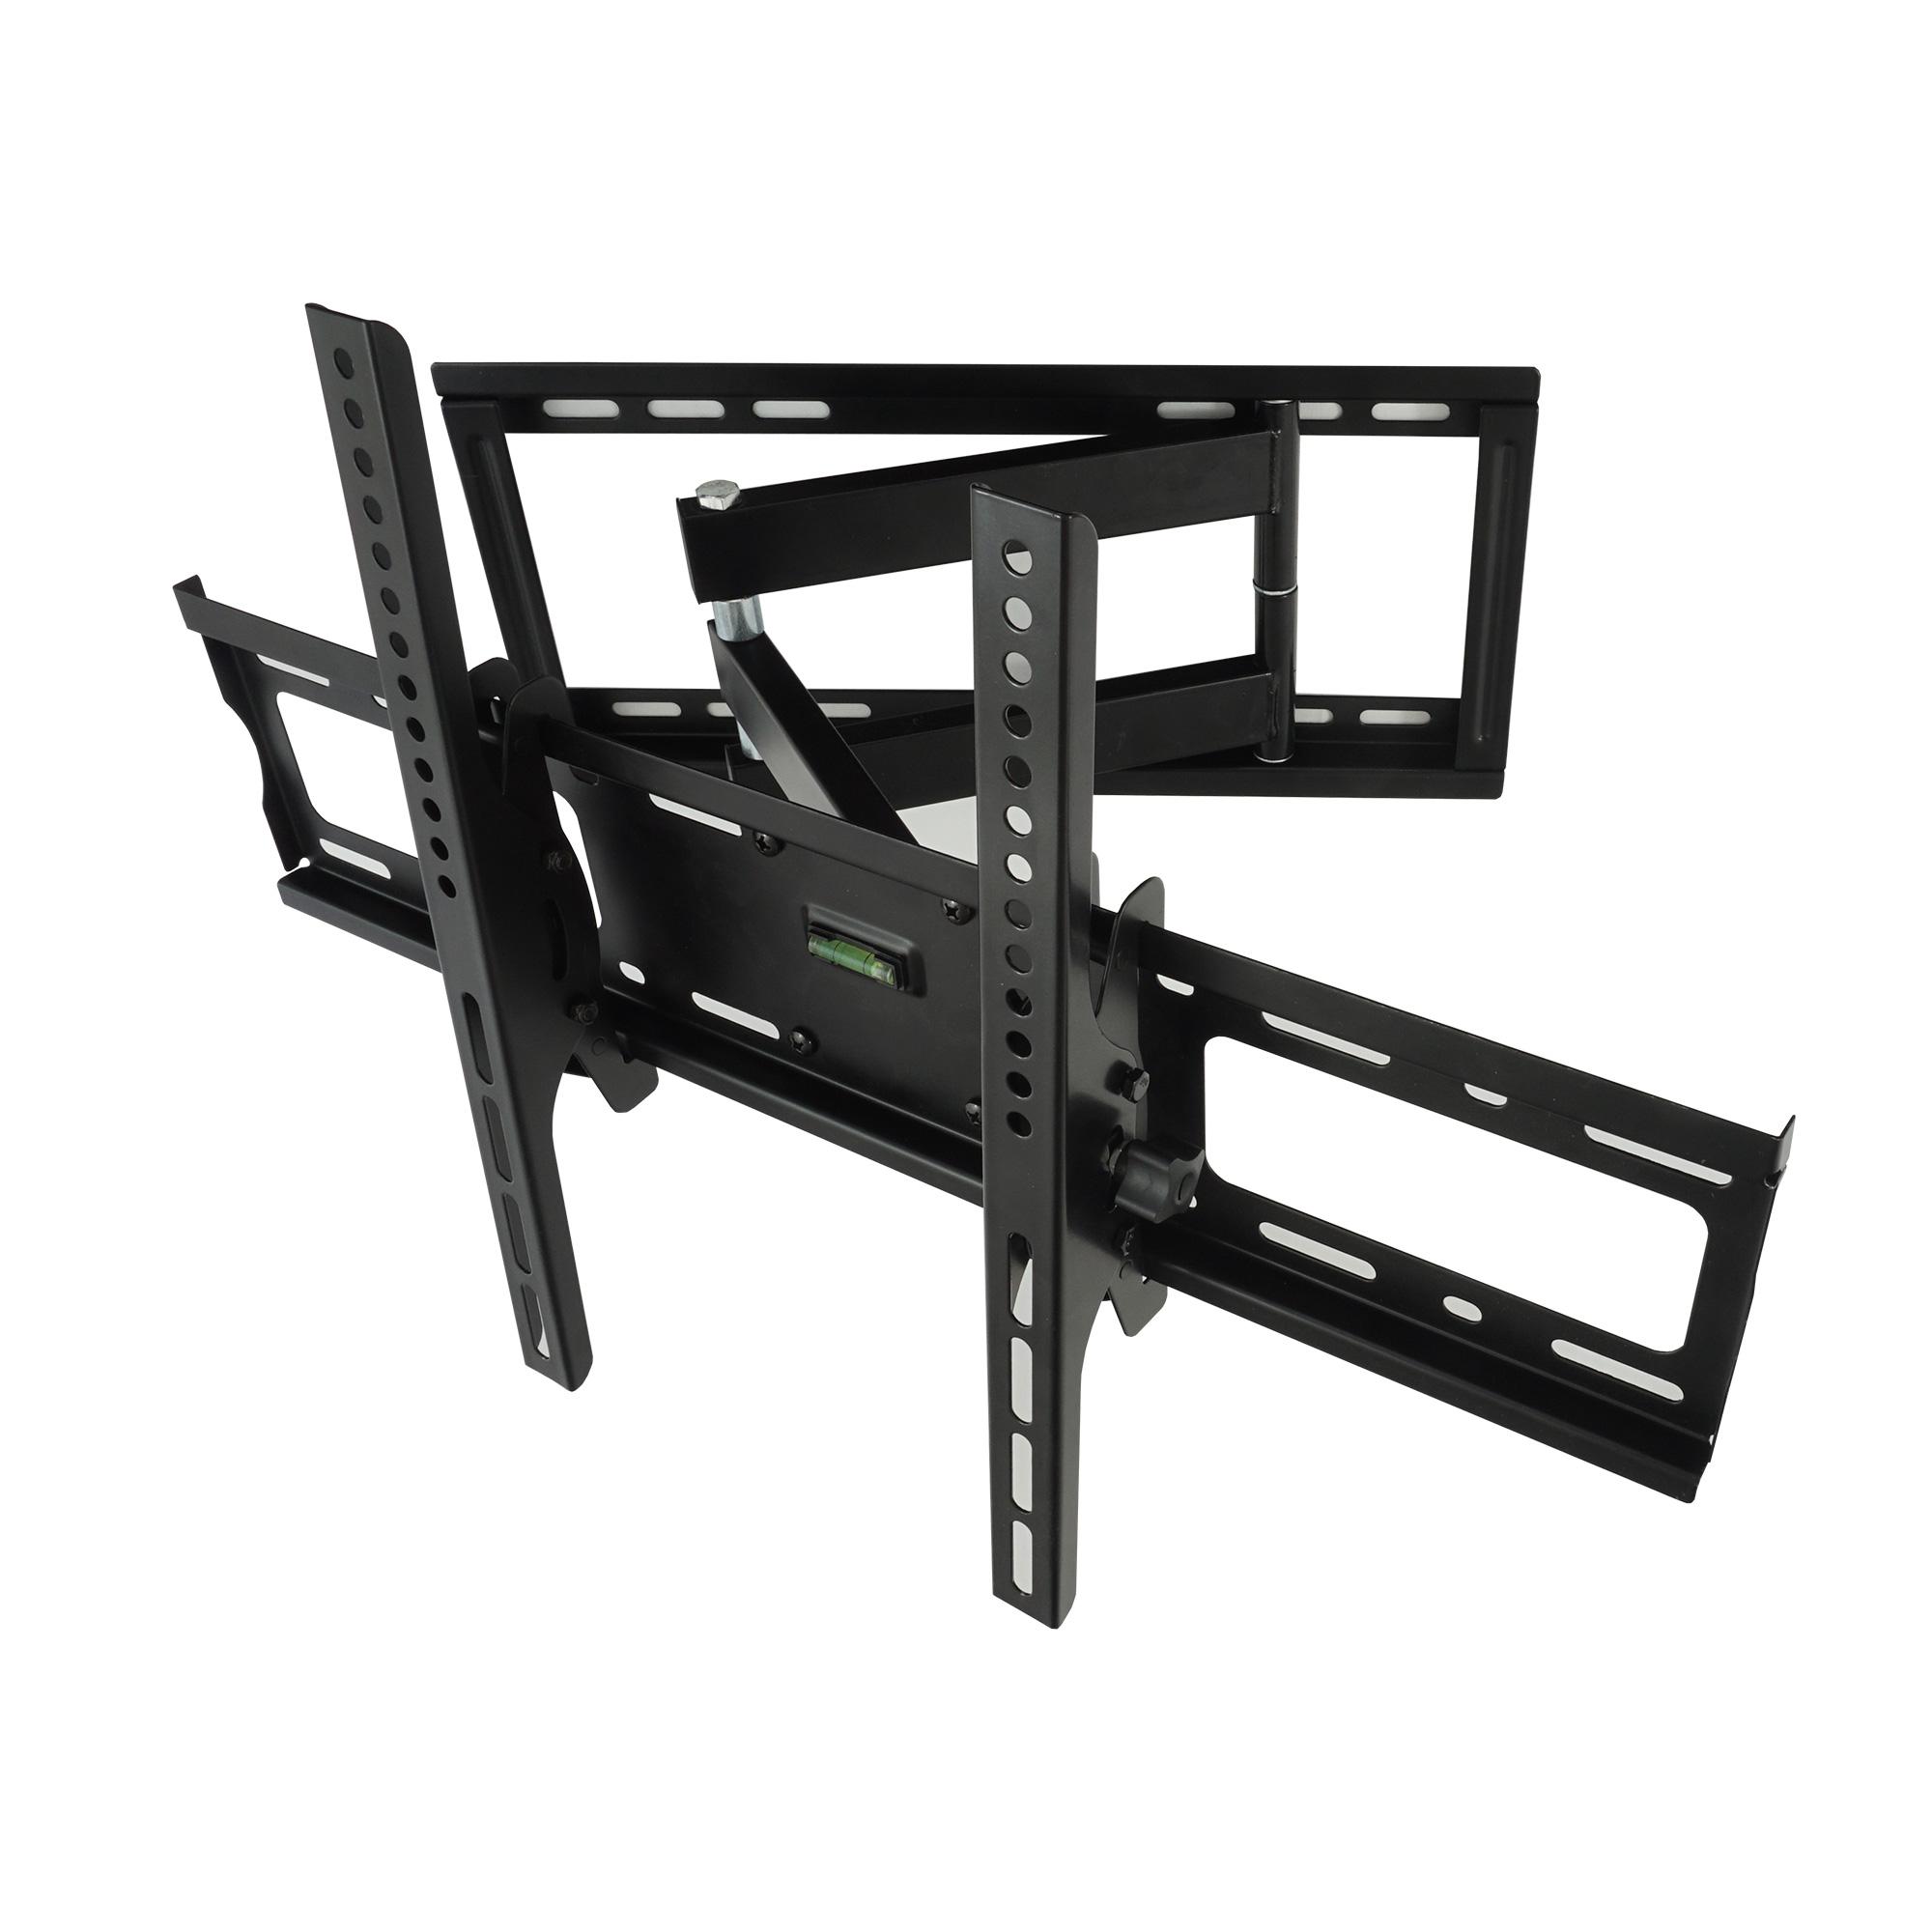 tv wandhalterung wandhalter wand halter befestigung lcd led plasma tv fernseher ebay. Black Bedroom Furniture Sets. Home Design Ideas